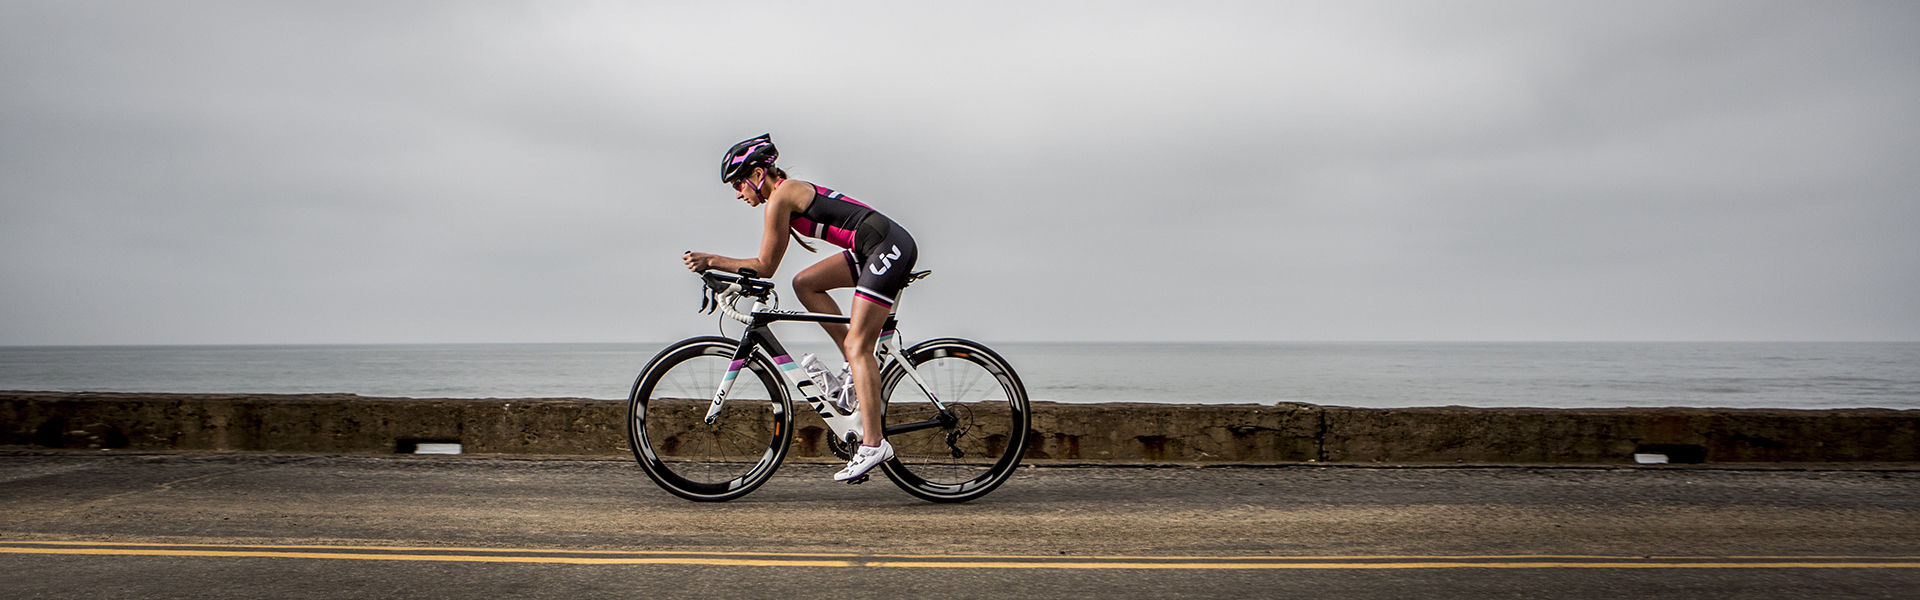 Gift Guide: The Triathlete | Liv